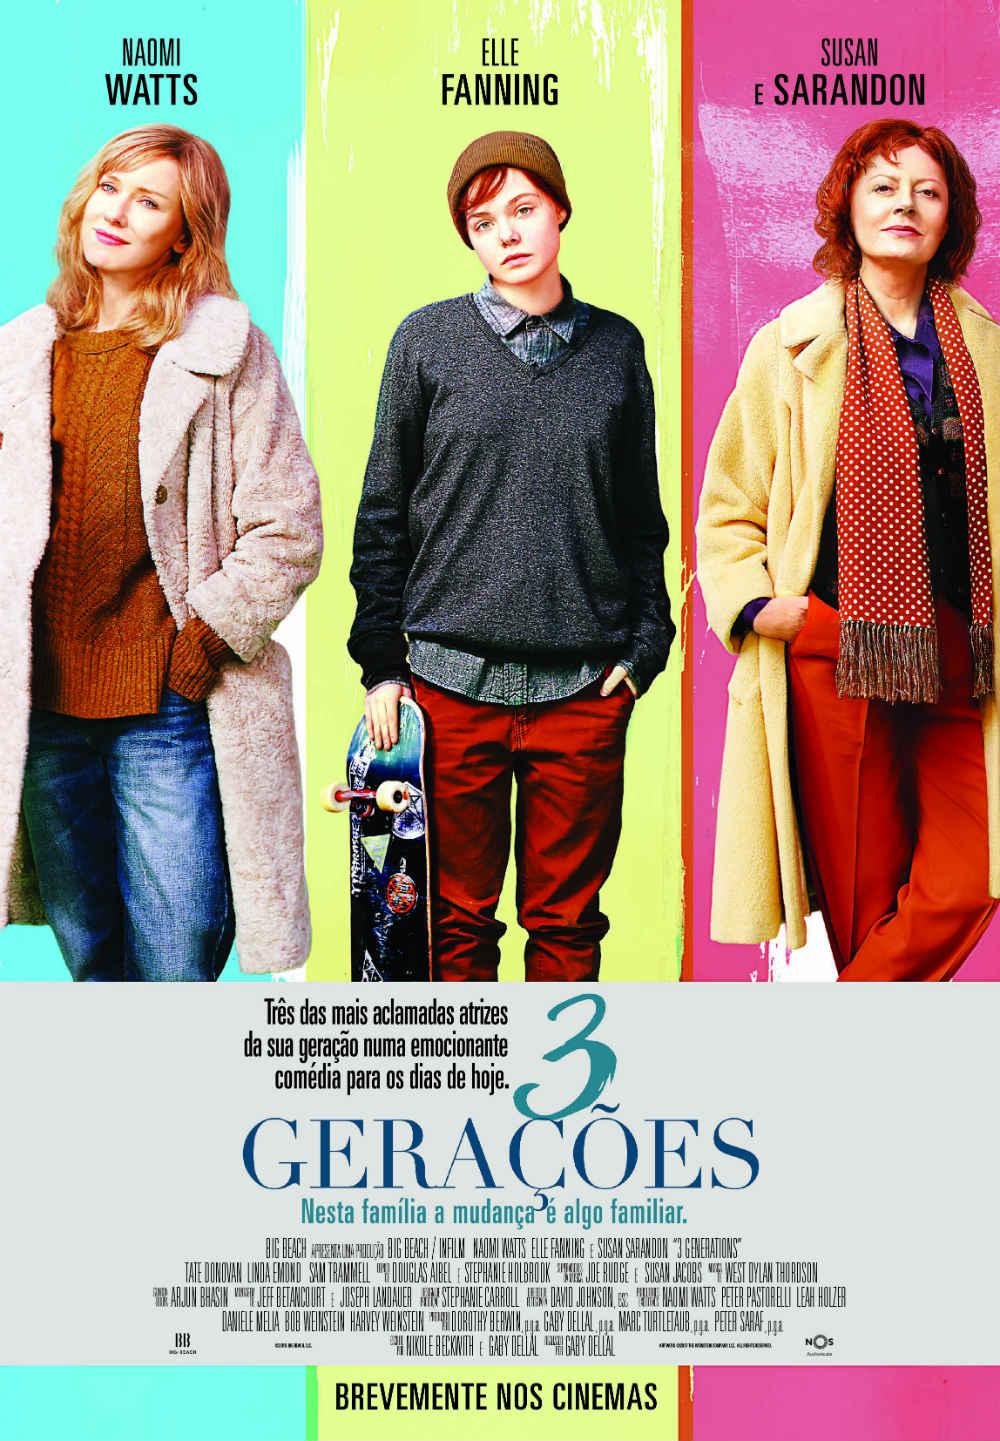 3 geracoes 3 generations